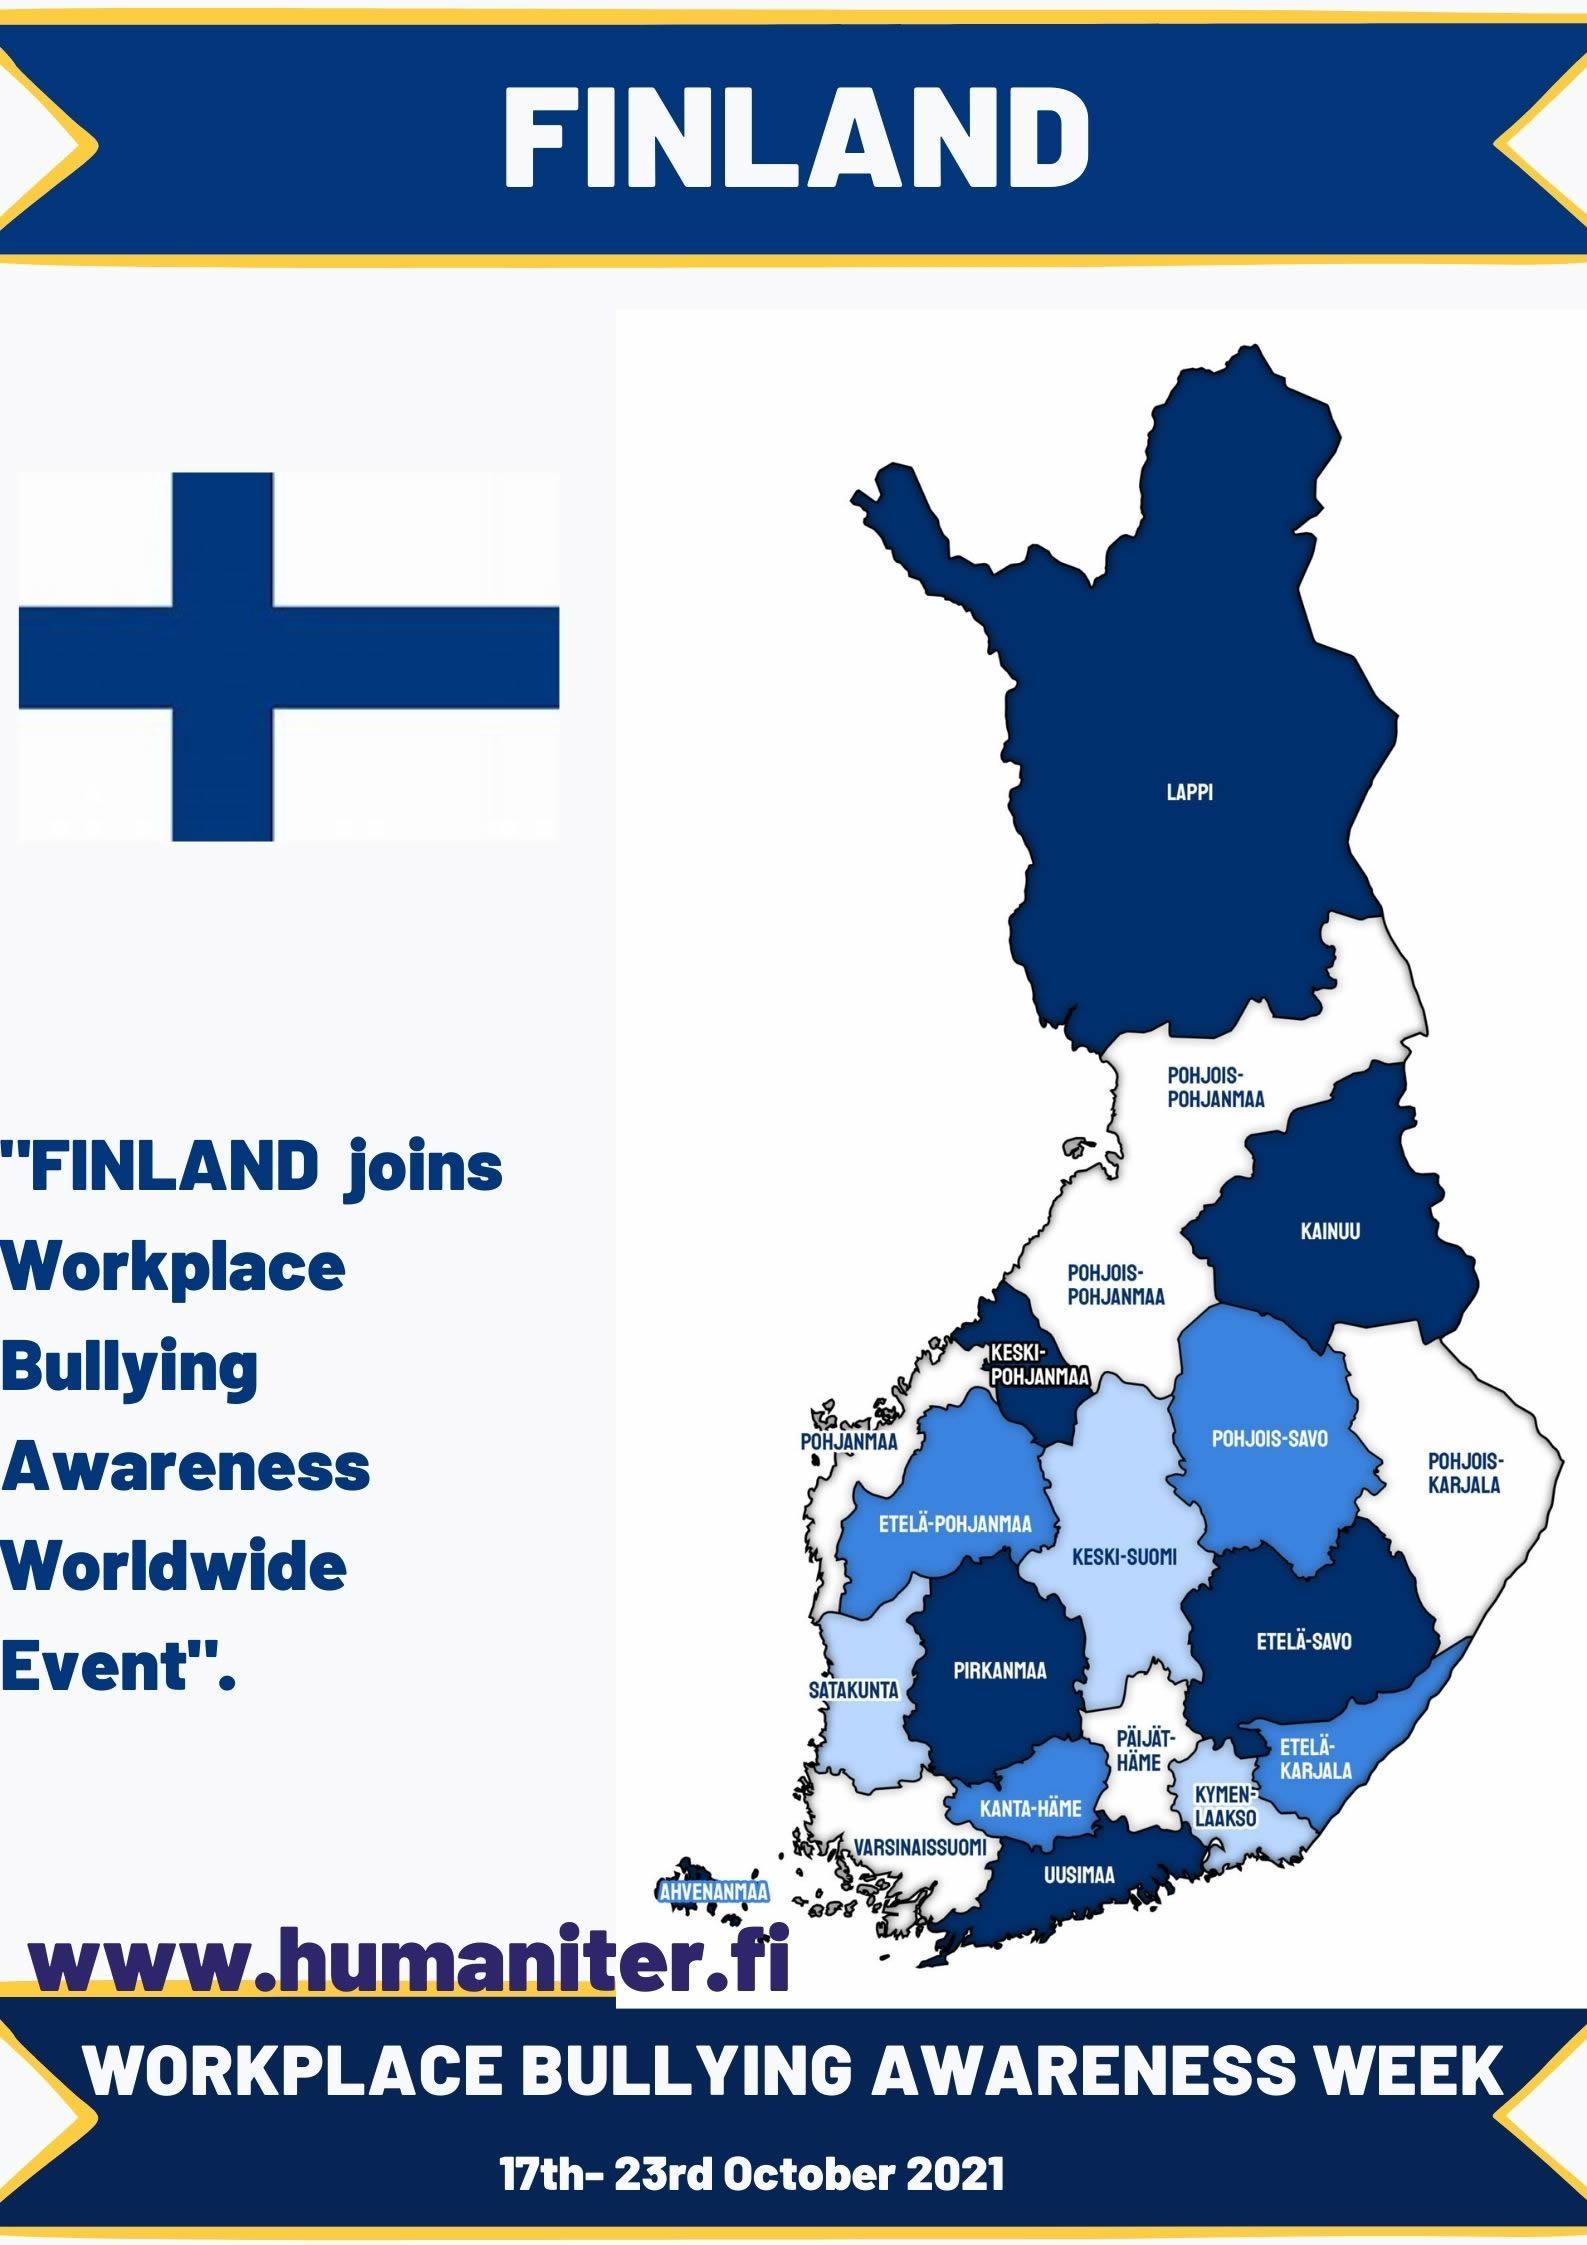 Workplace Bullying Awareness Week 2021, Finland